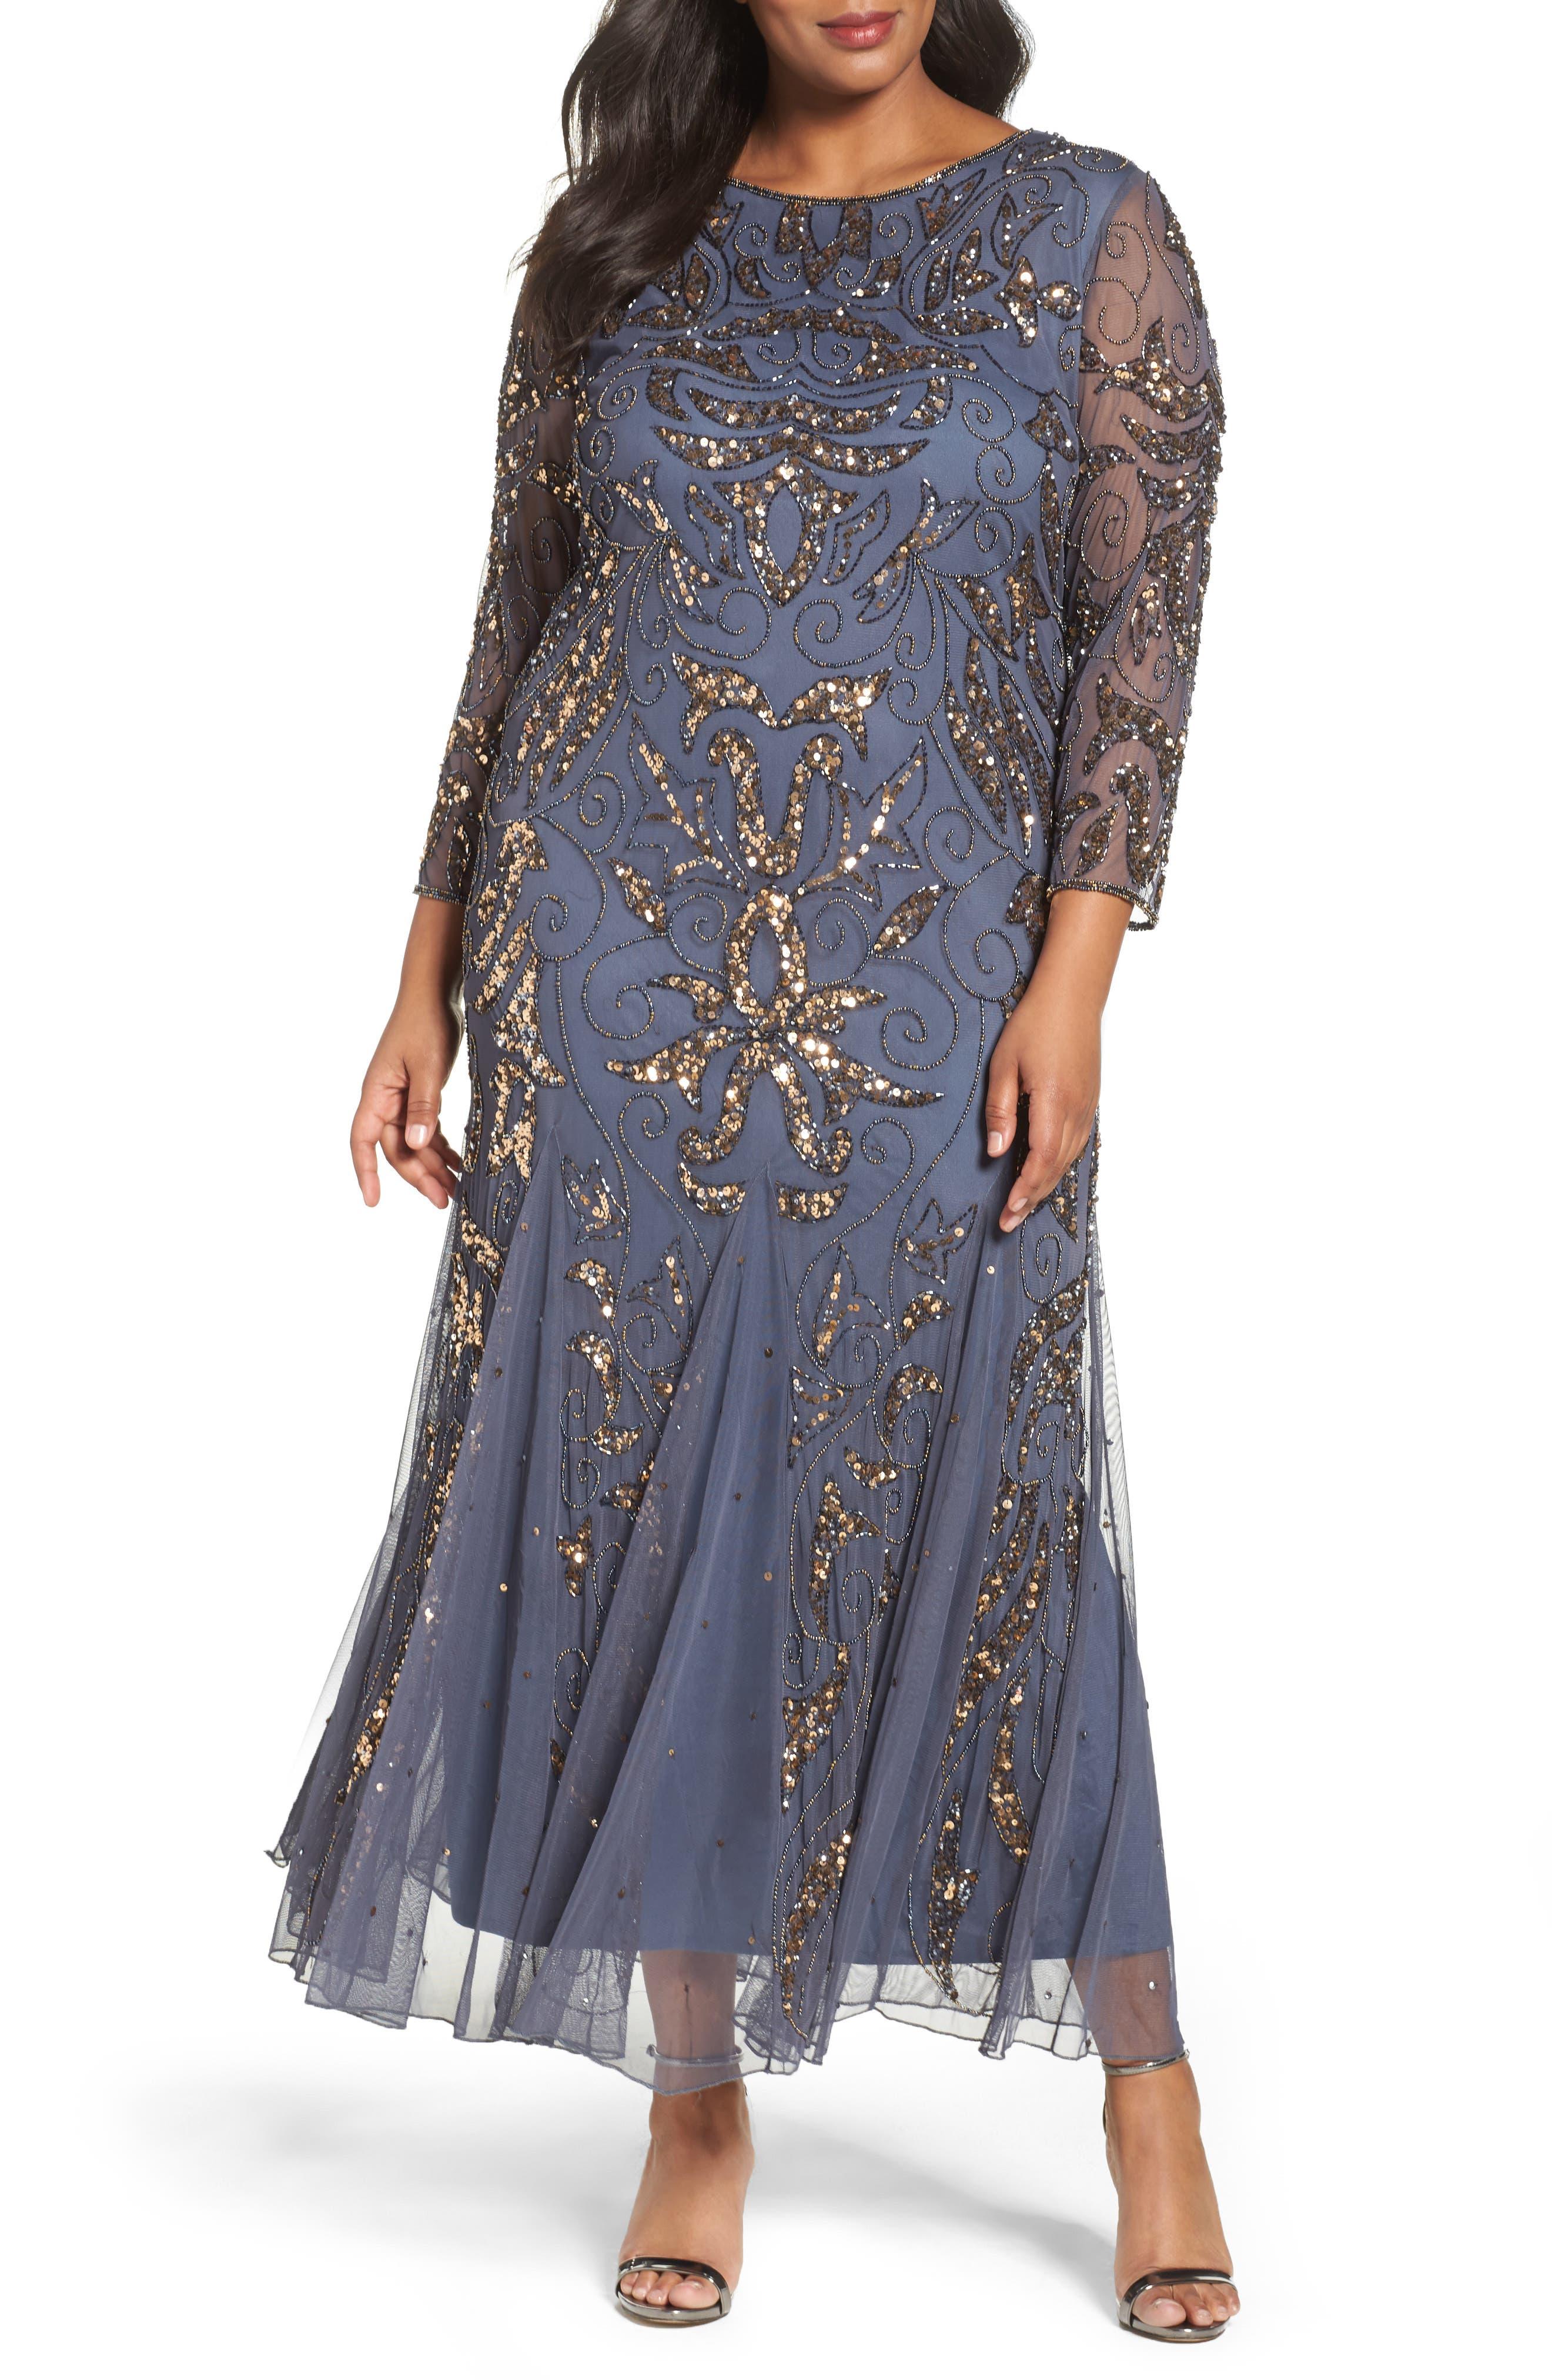 Pisarro Nights Embellished Three Quarter Sleeve Gown (Plus Size)